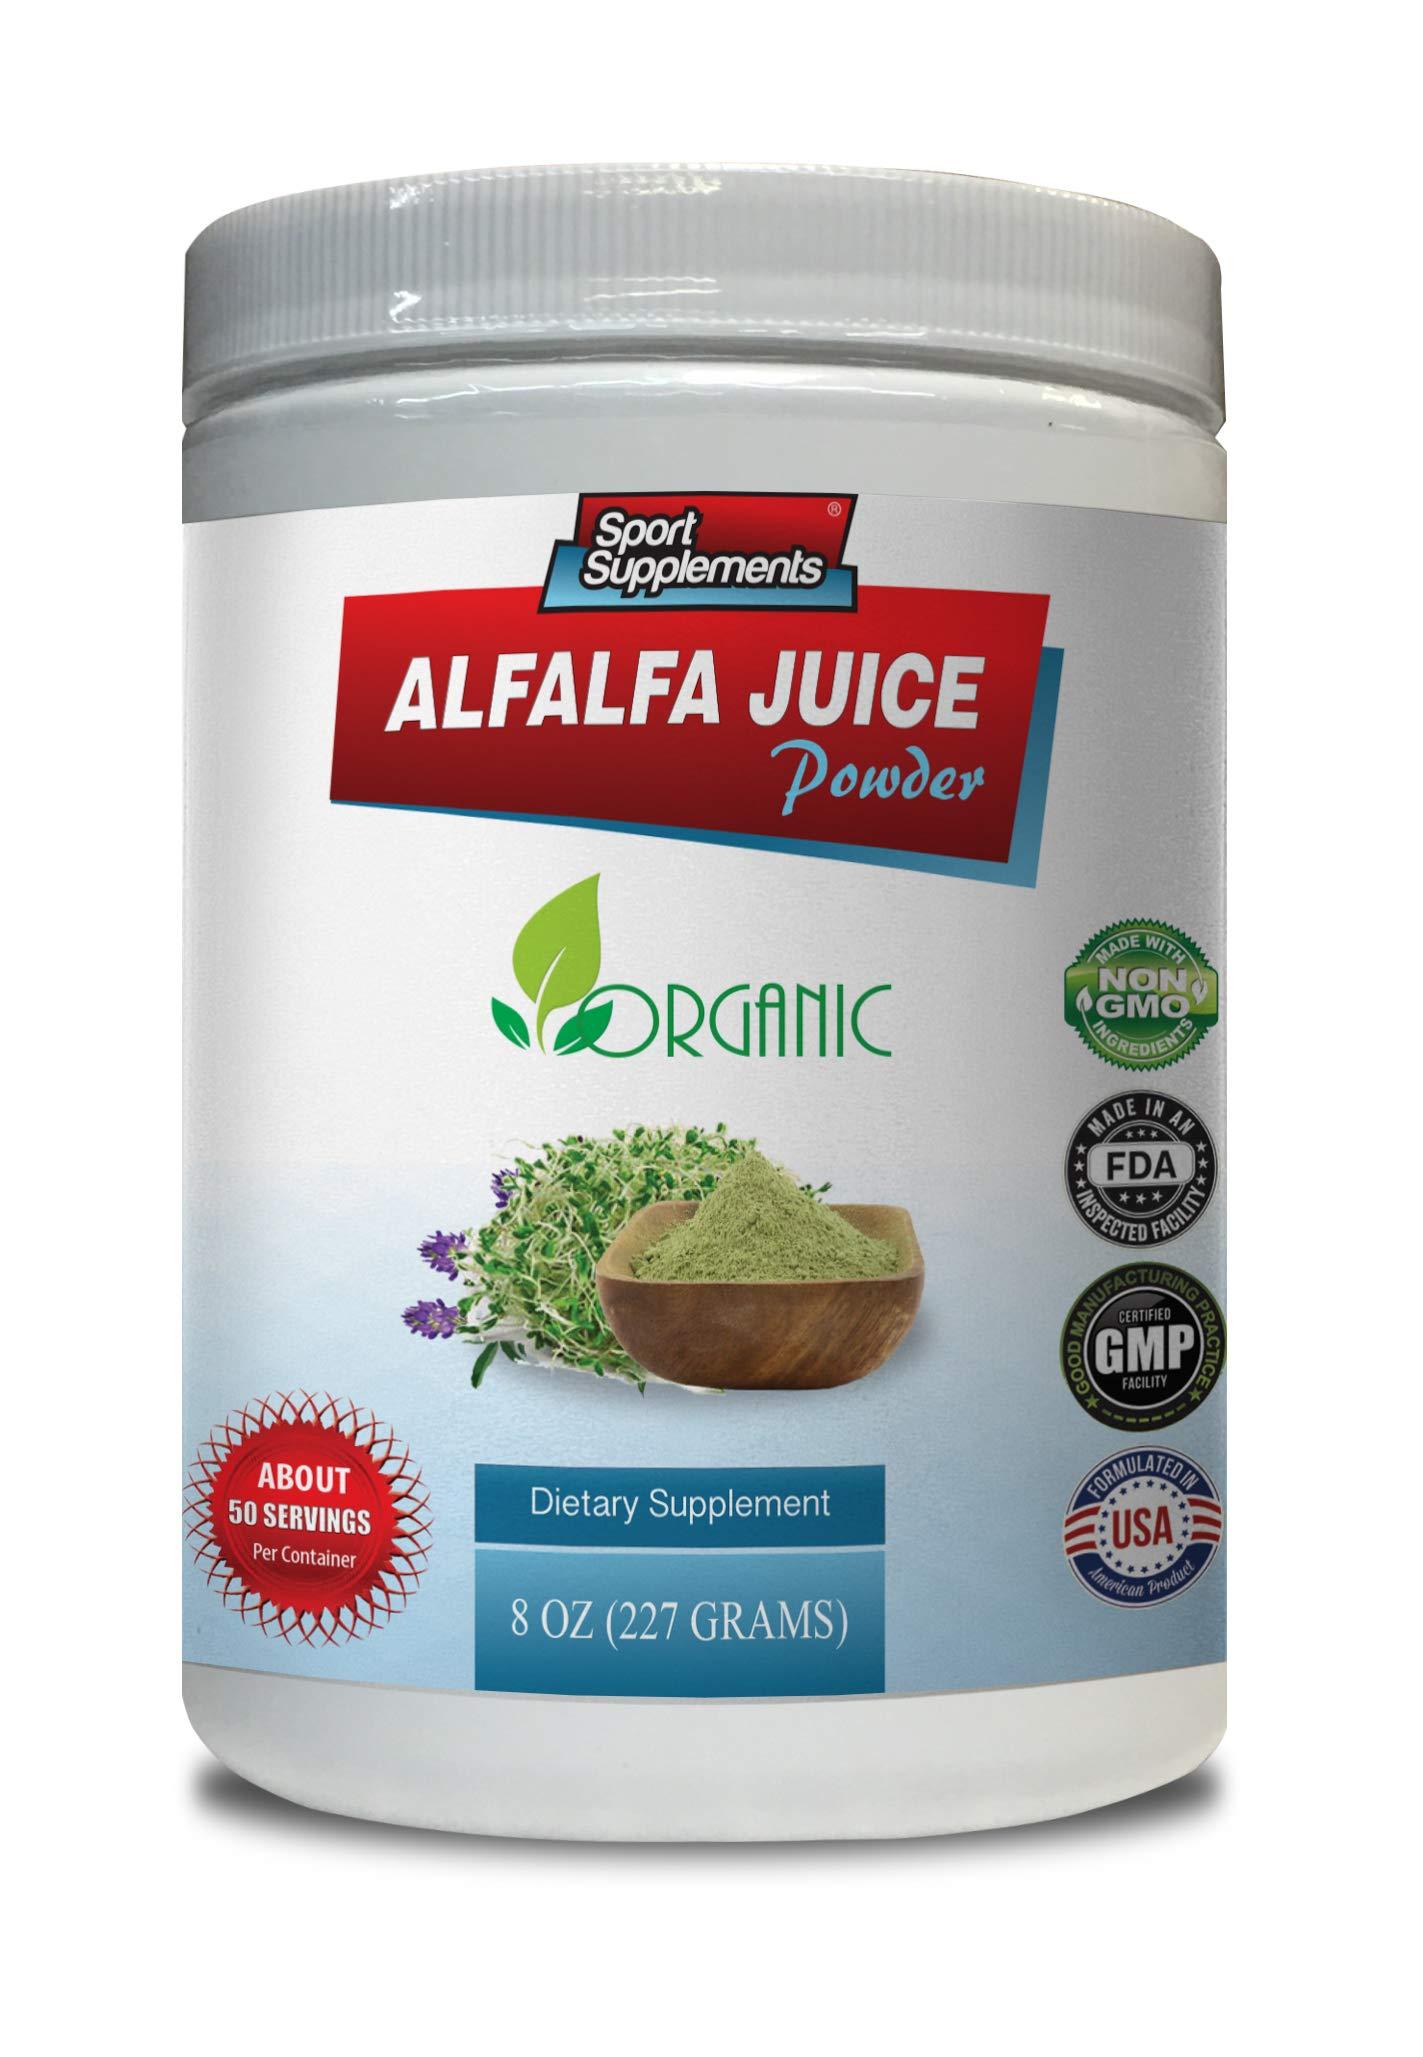 Organic antioxidant Powder - Alfalfa Juice Powder - Organic Dietary Supplement - Alfalfa Leaf Powder - 1 Can 8 OZ (50 Servings)